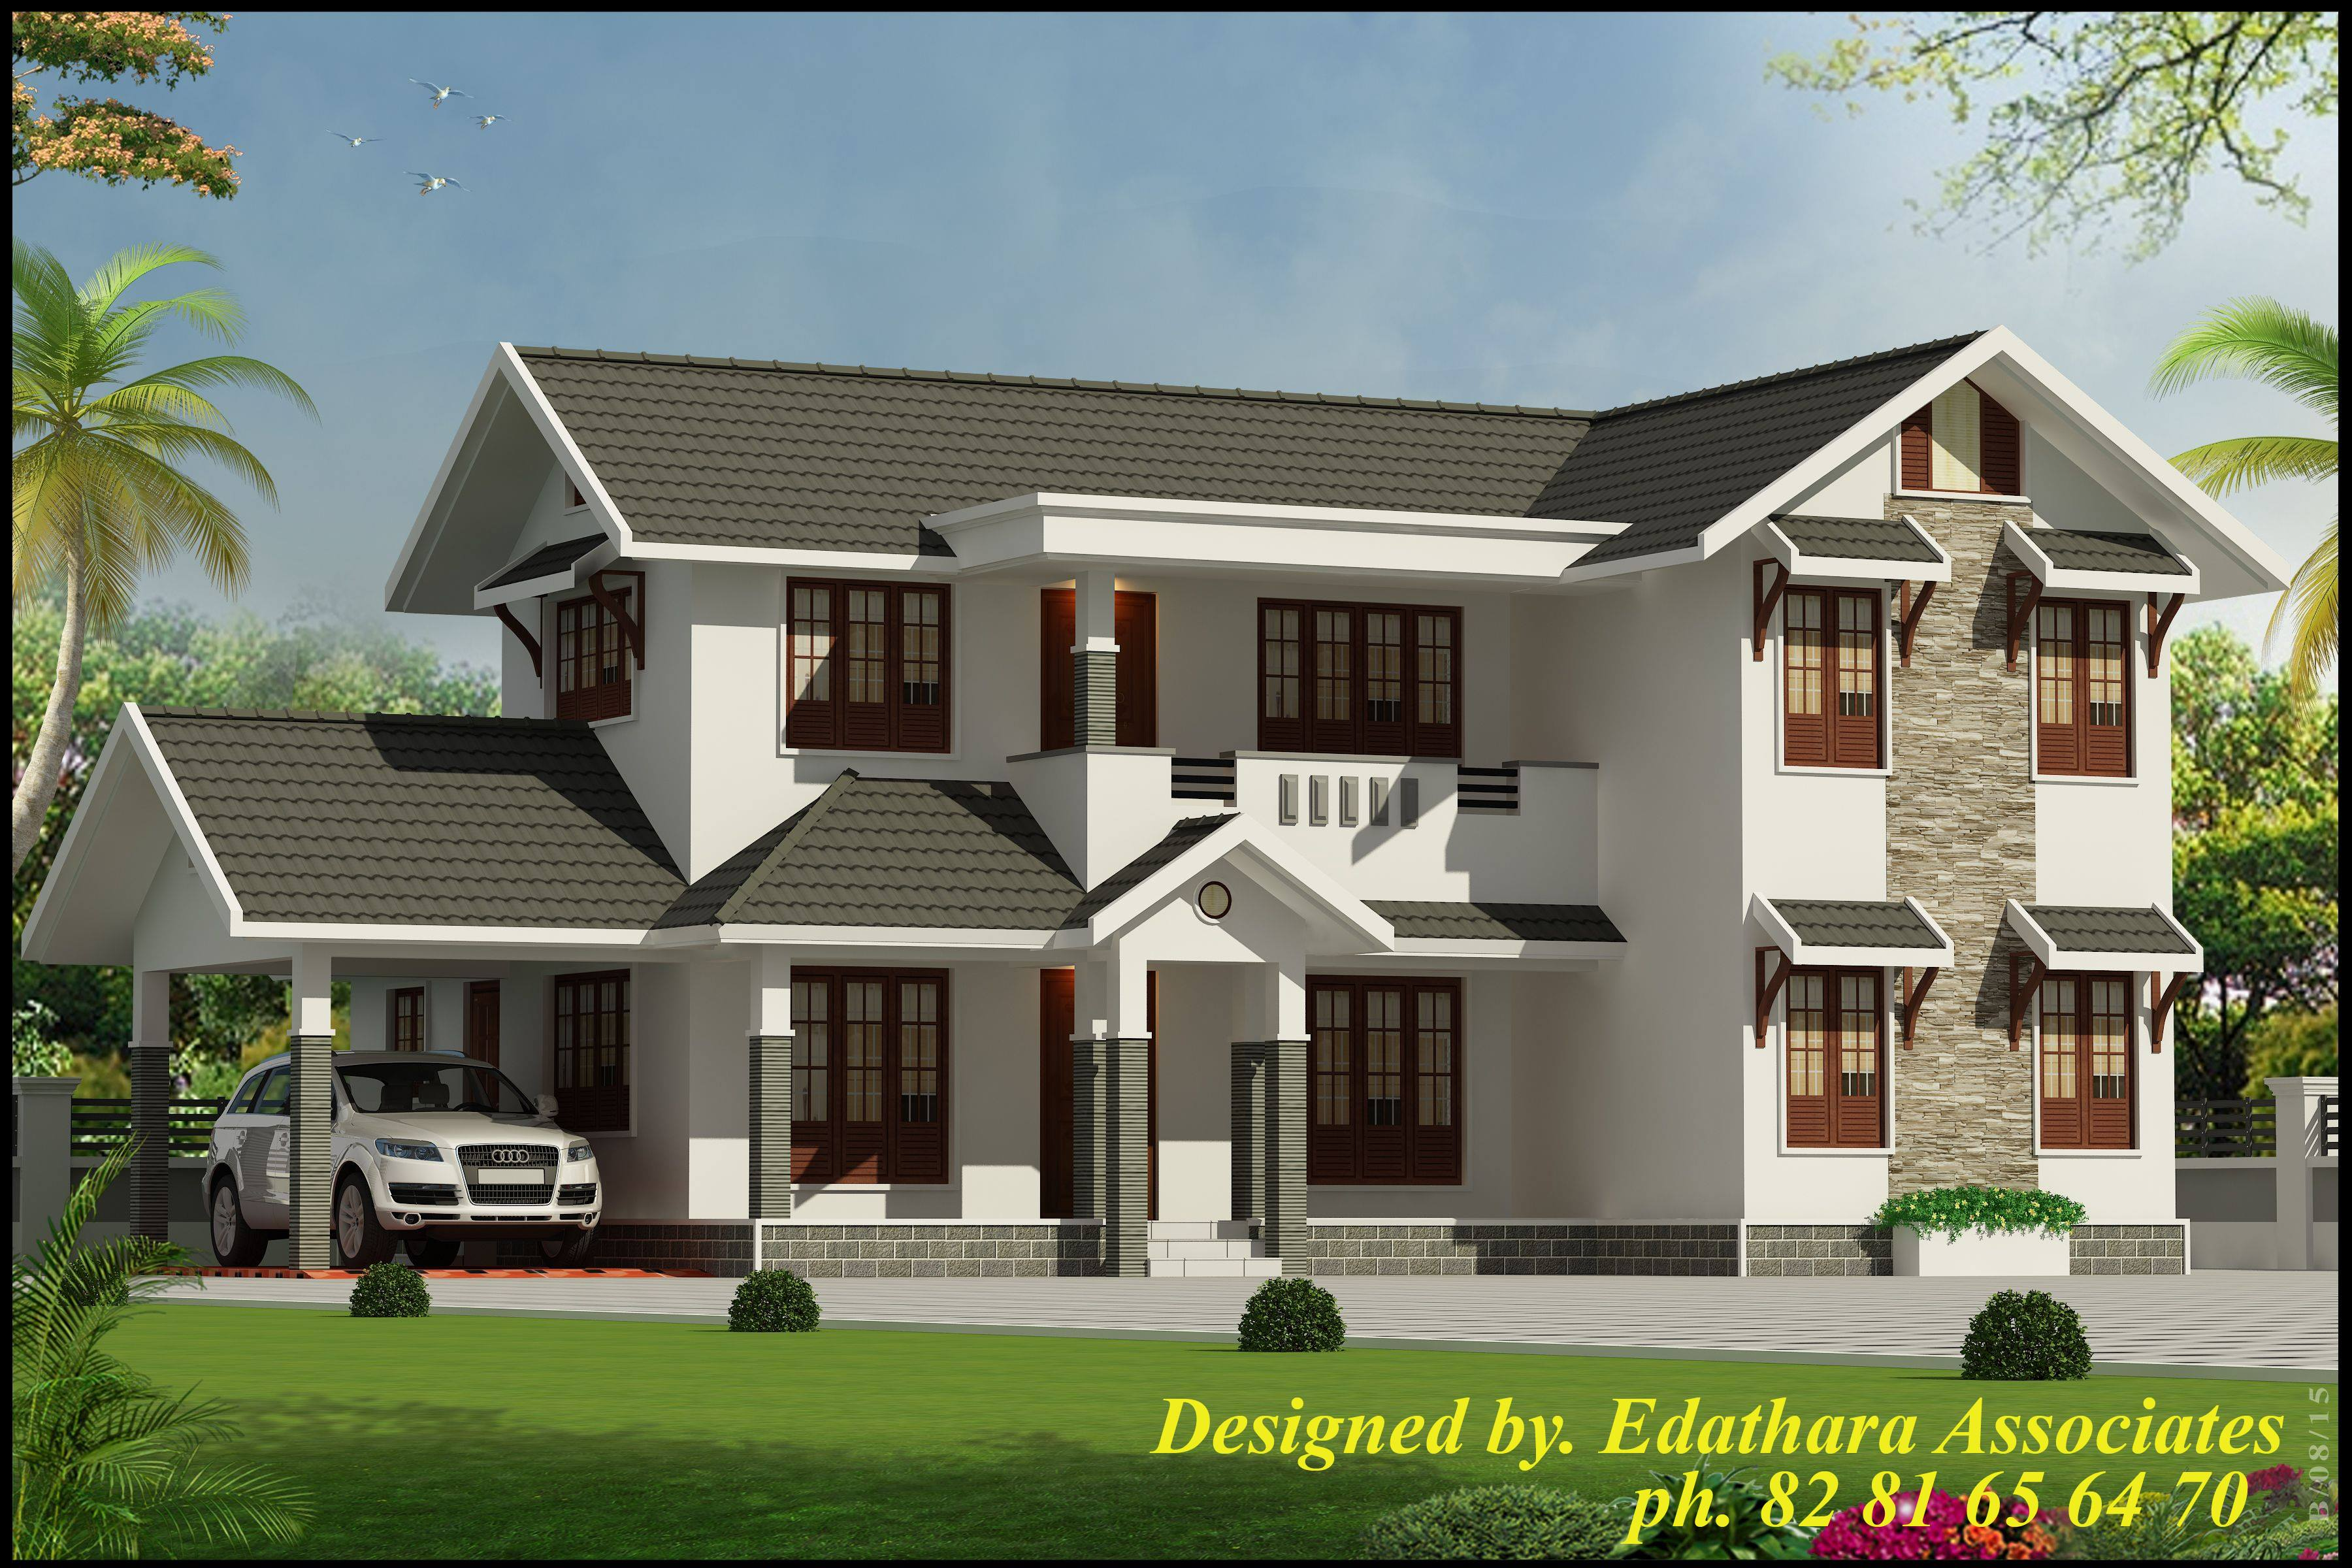 Photo of 2722 Sq Ft, Modern, Double Floor Kerala Home